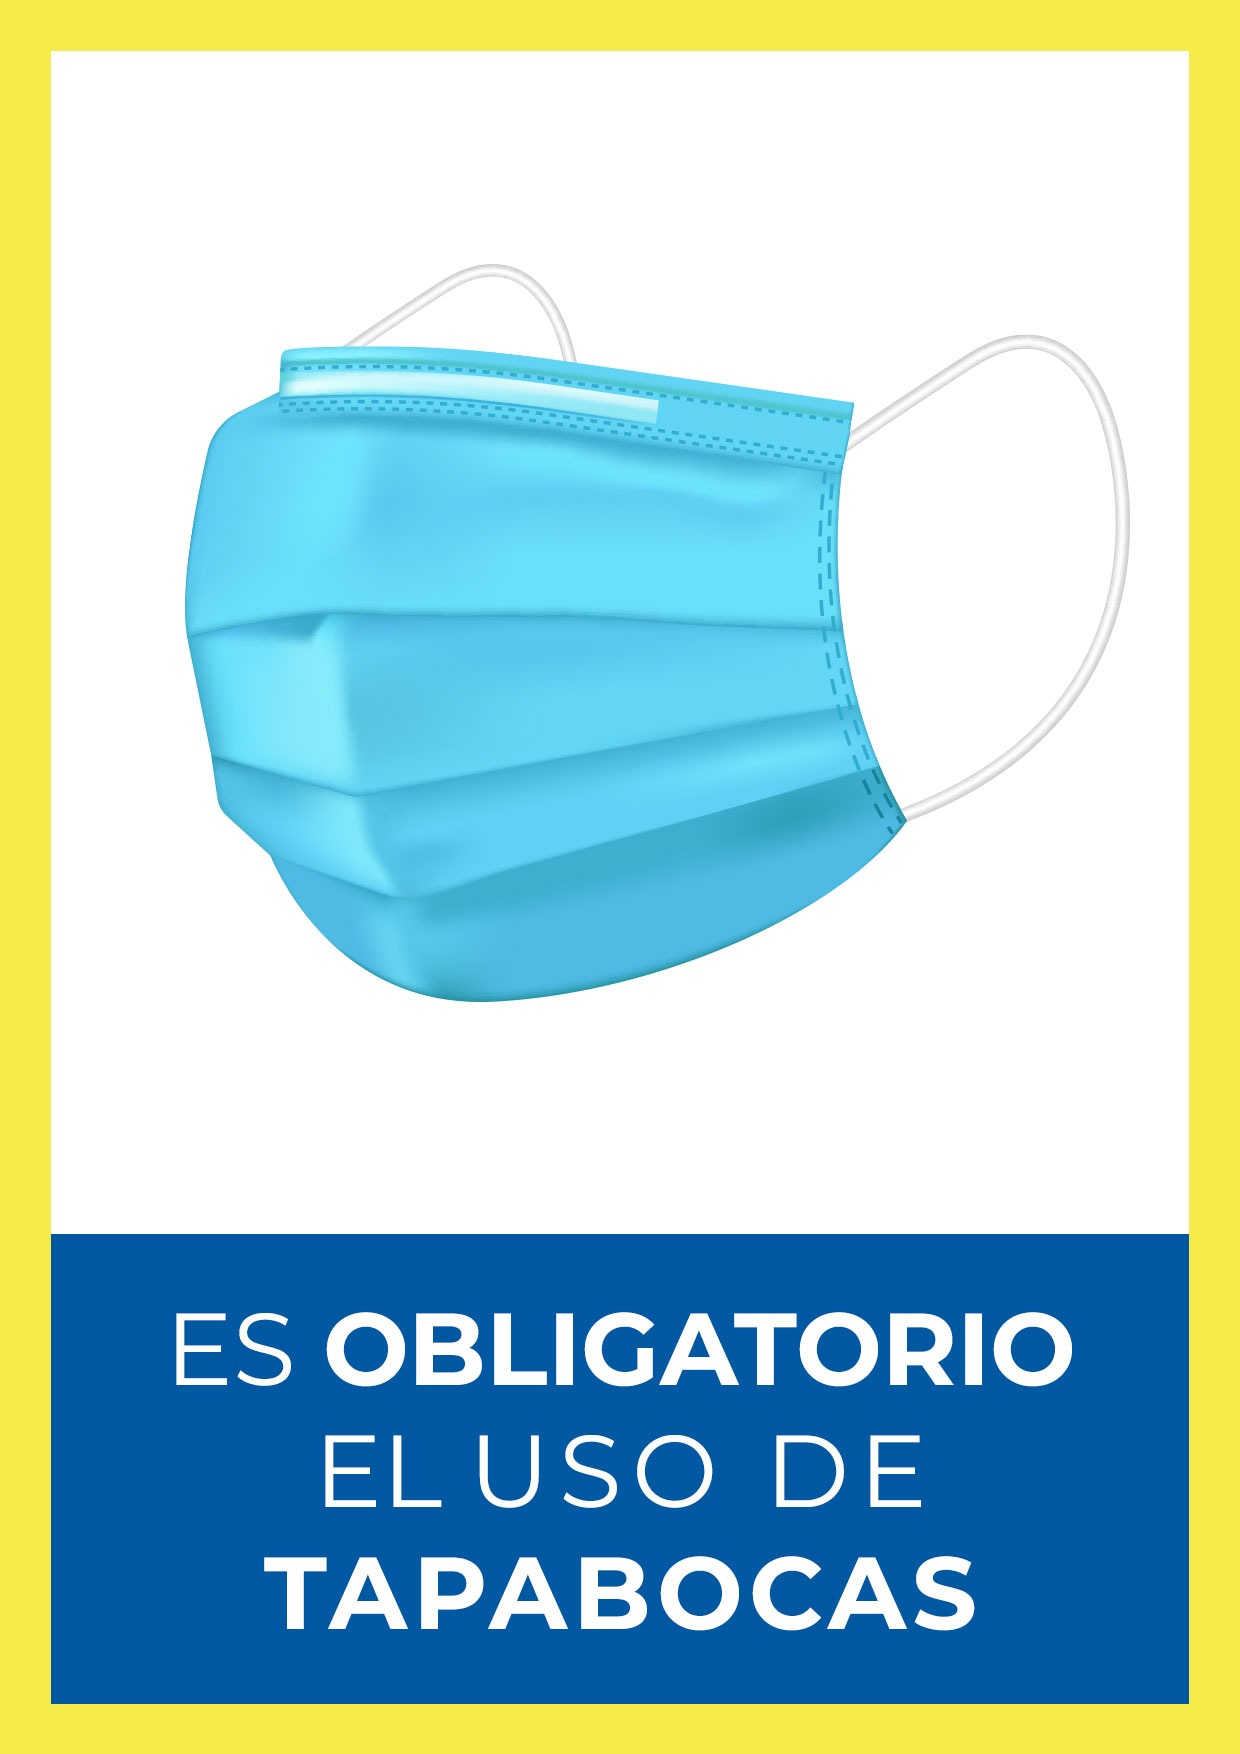 letrero uso obligatorio TAPABOCAS para imprimir4